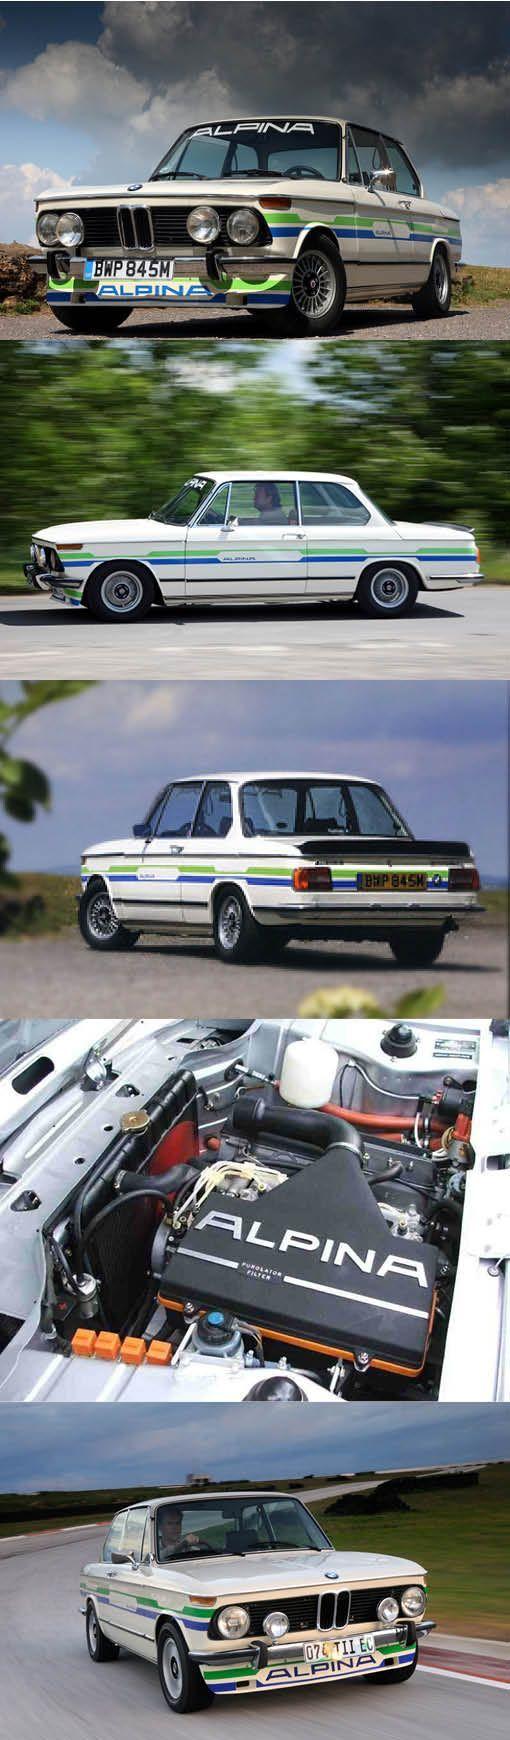 1972 BMW Alpina A4S 2002 e10